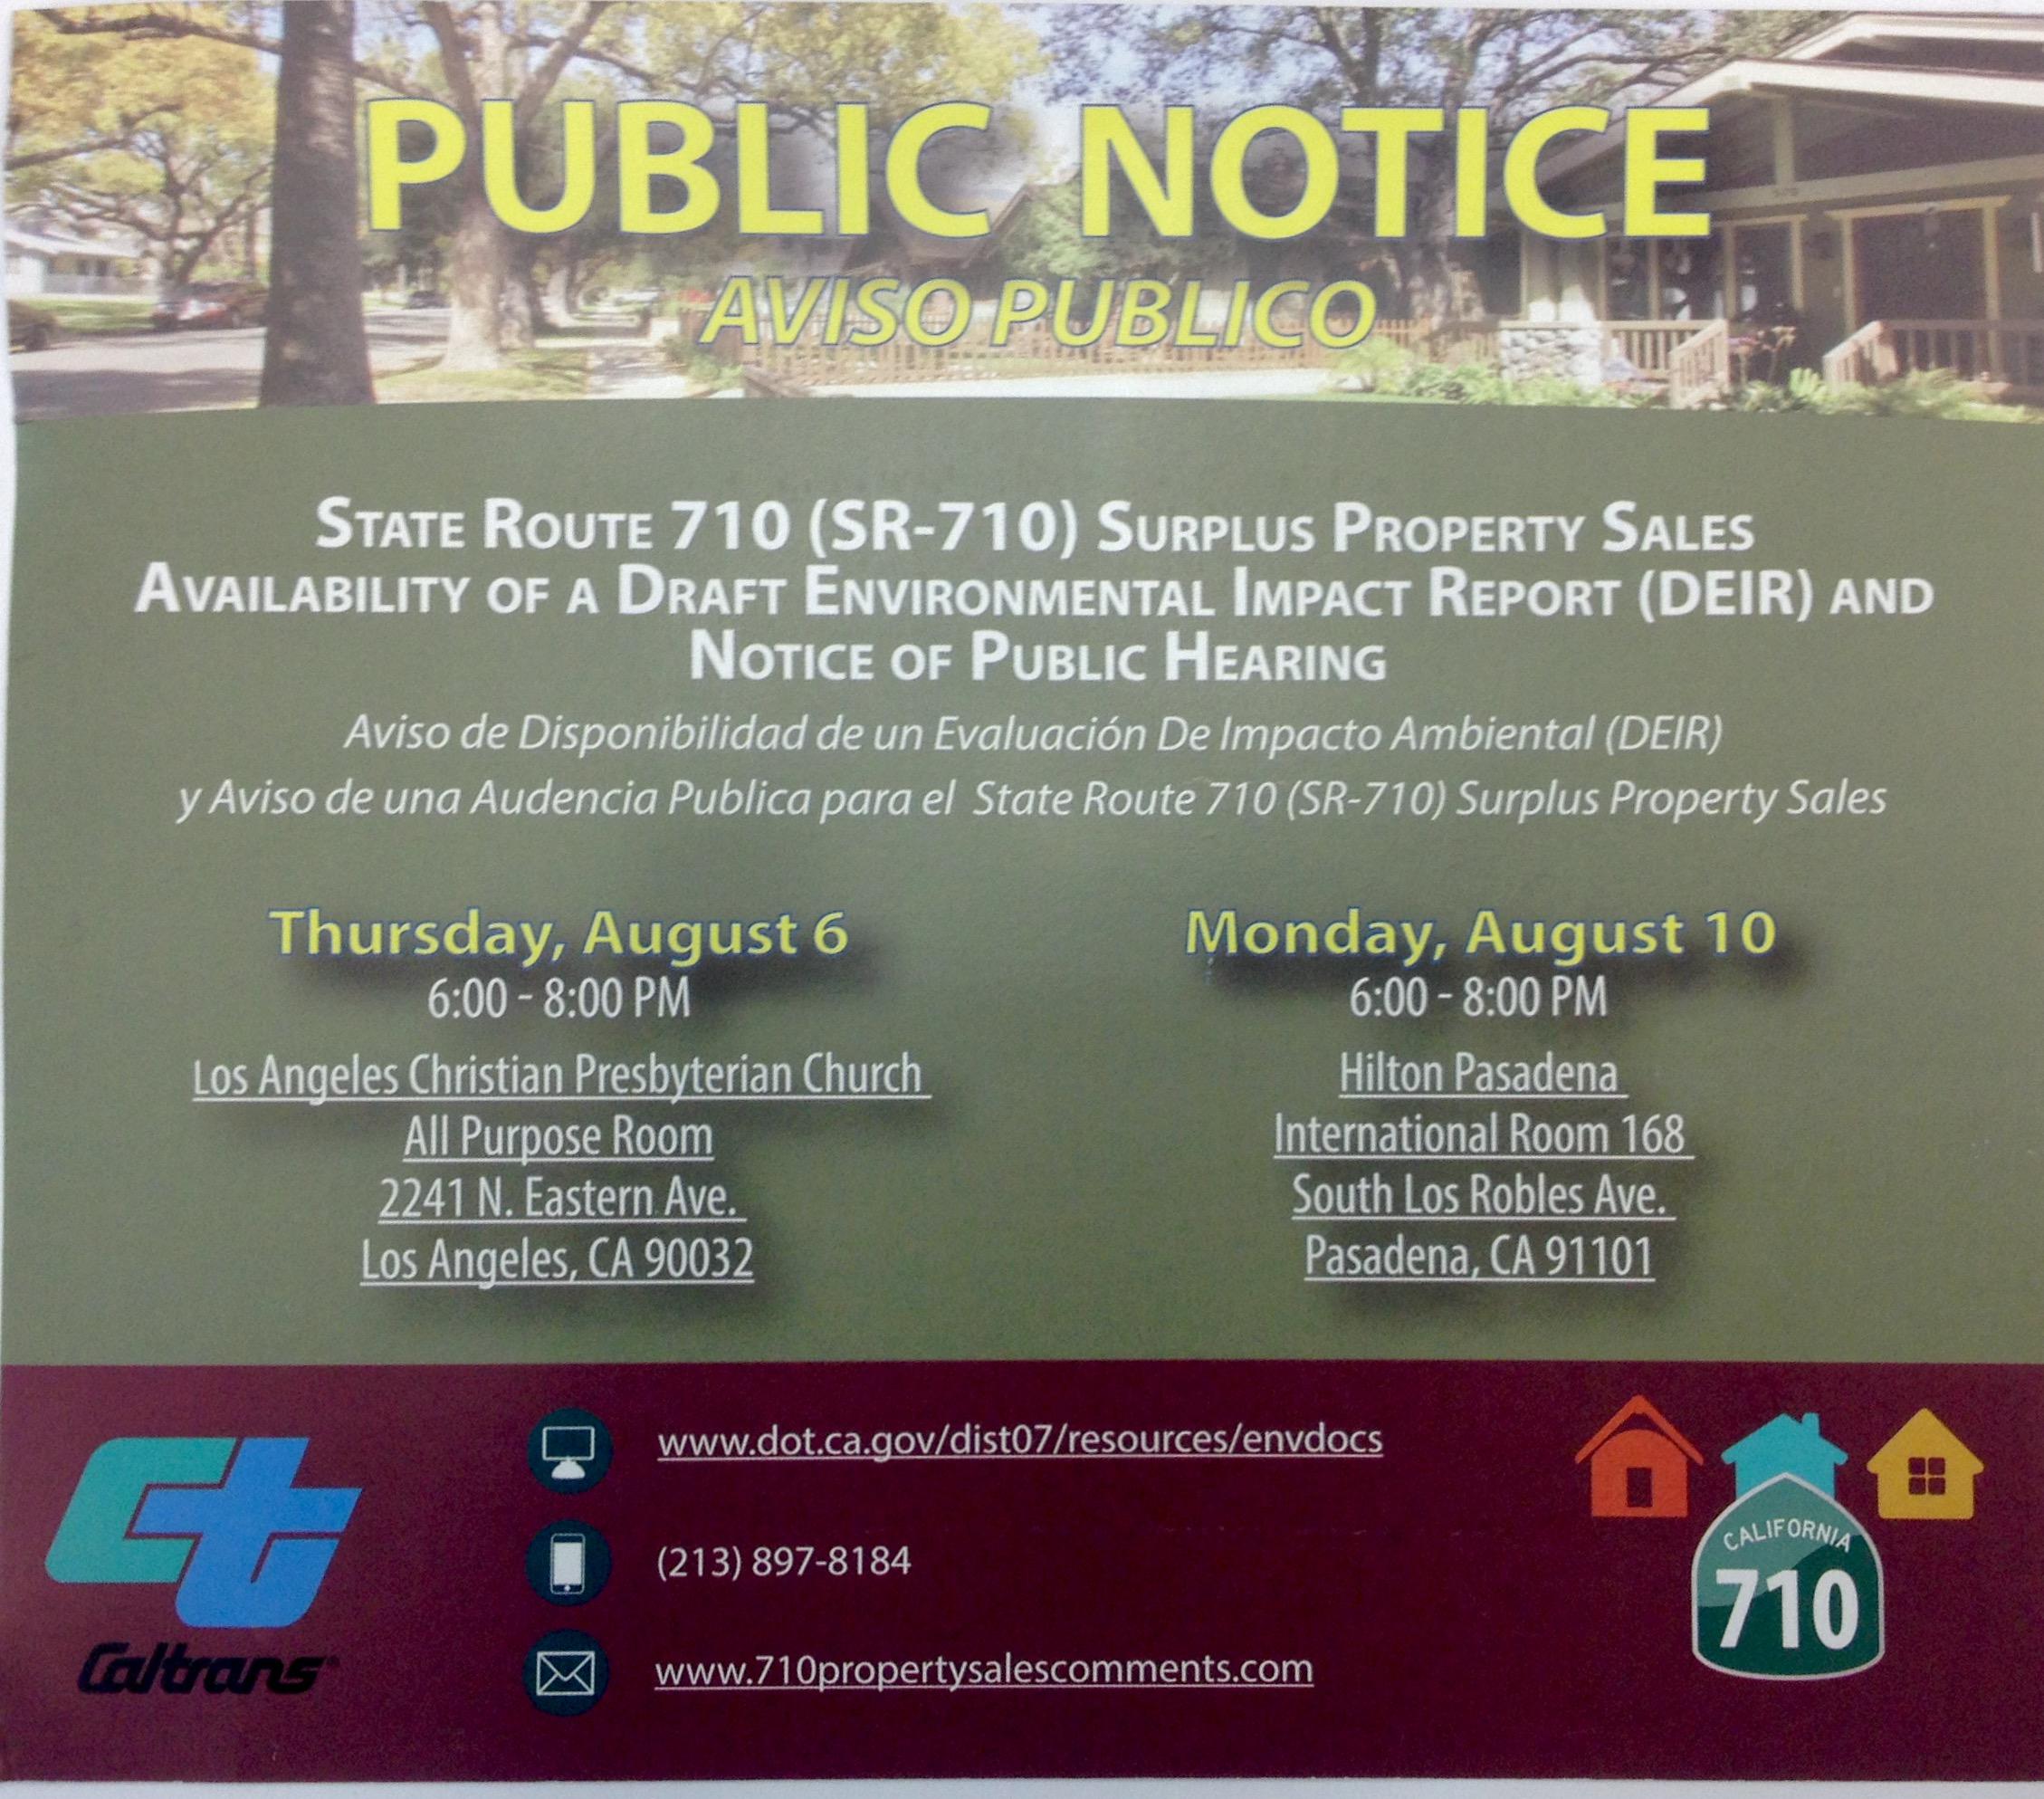 public_notice.jpg